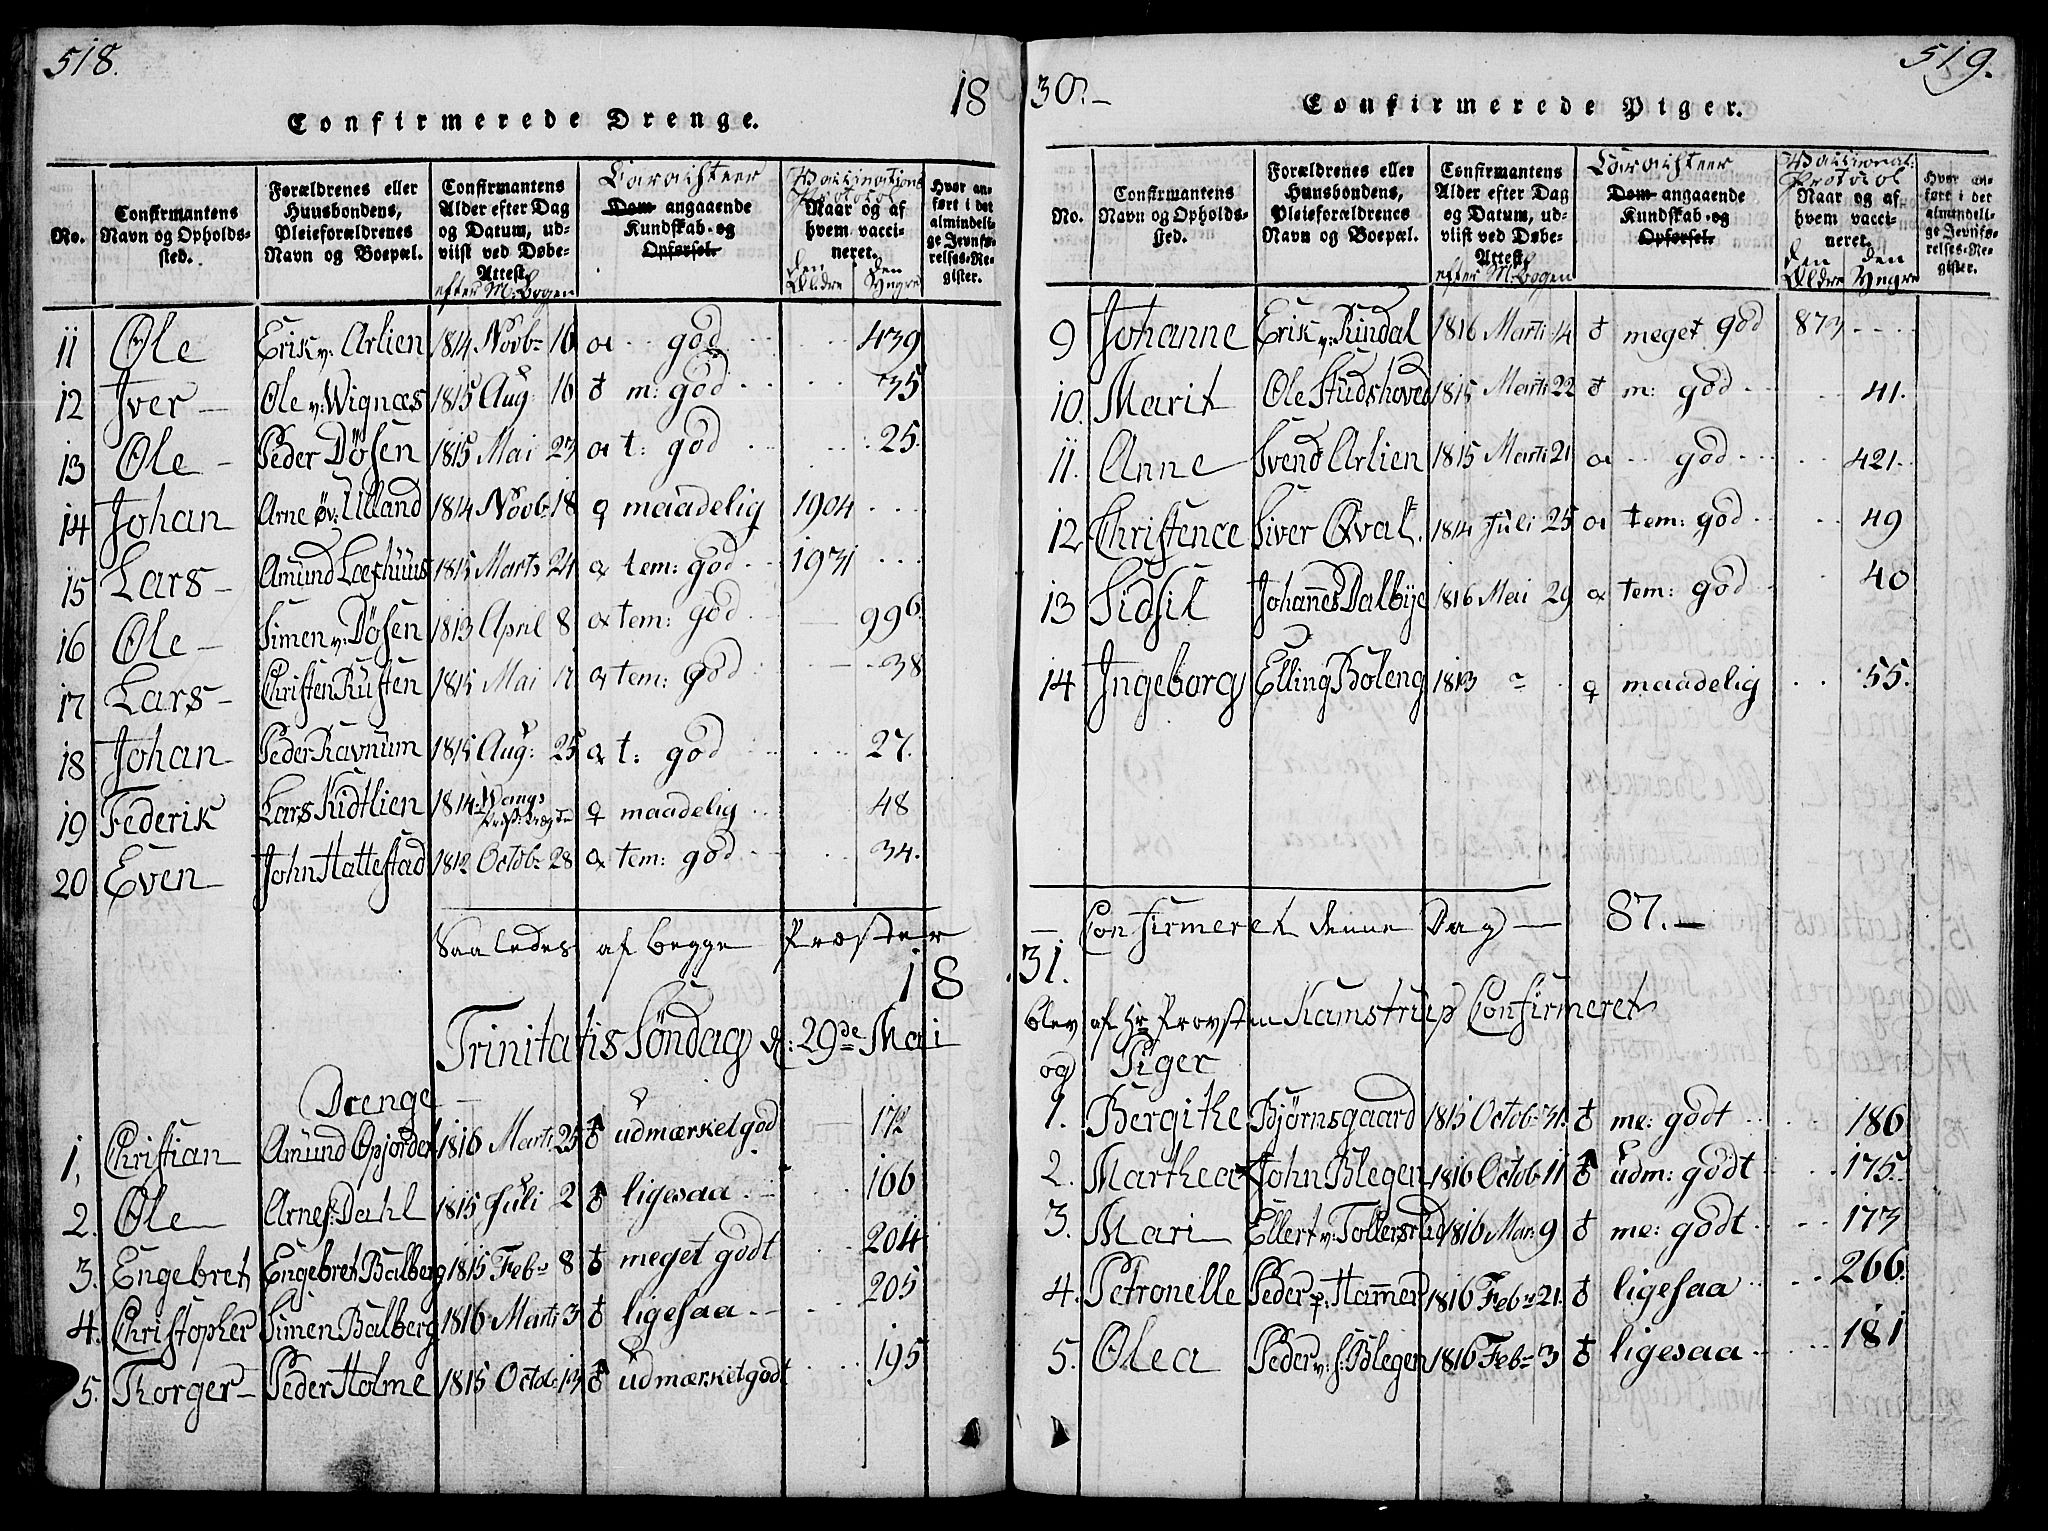 SAH, Fåberg prestekontor, Klokkerbok nr. 4, 1818-1837, s. 518-519